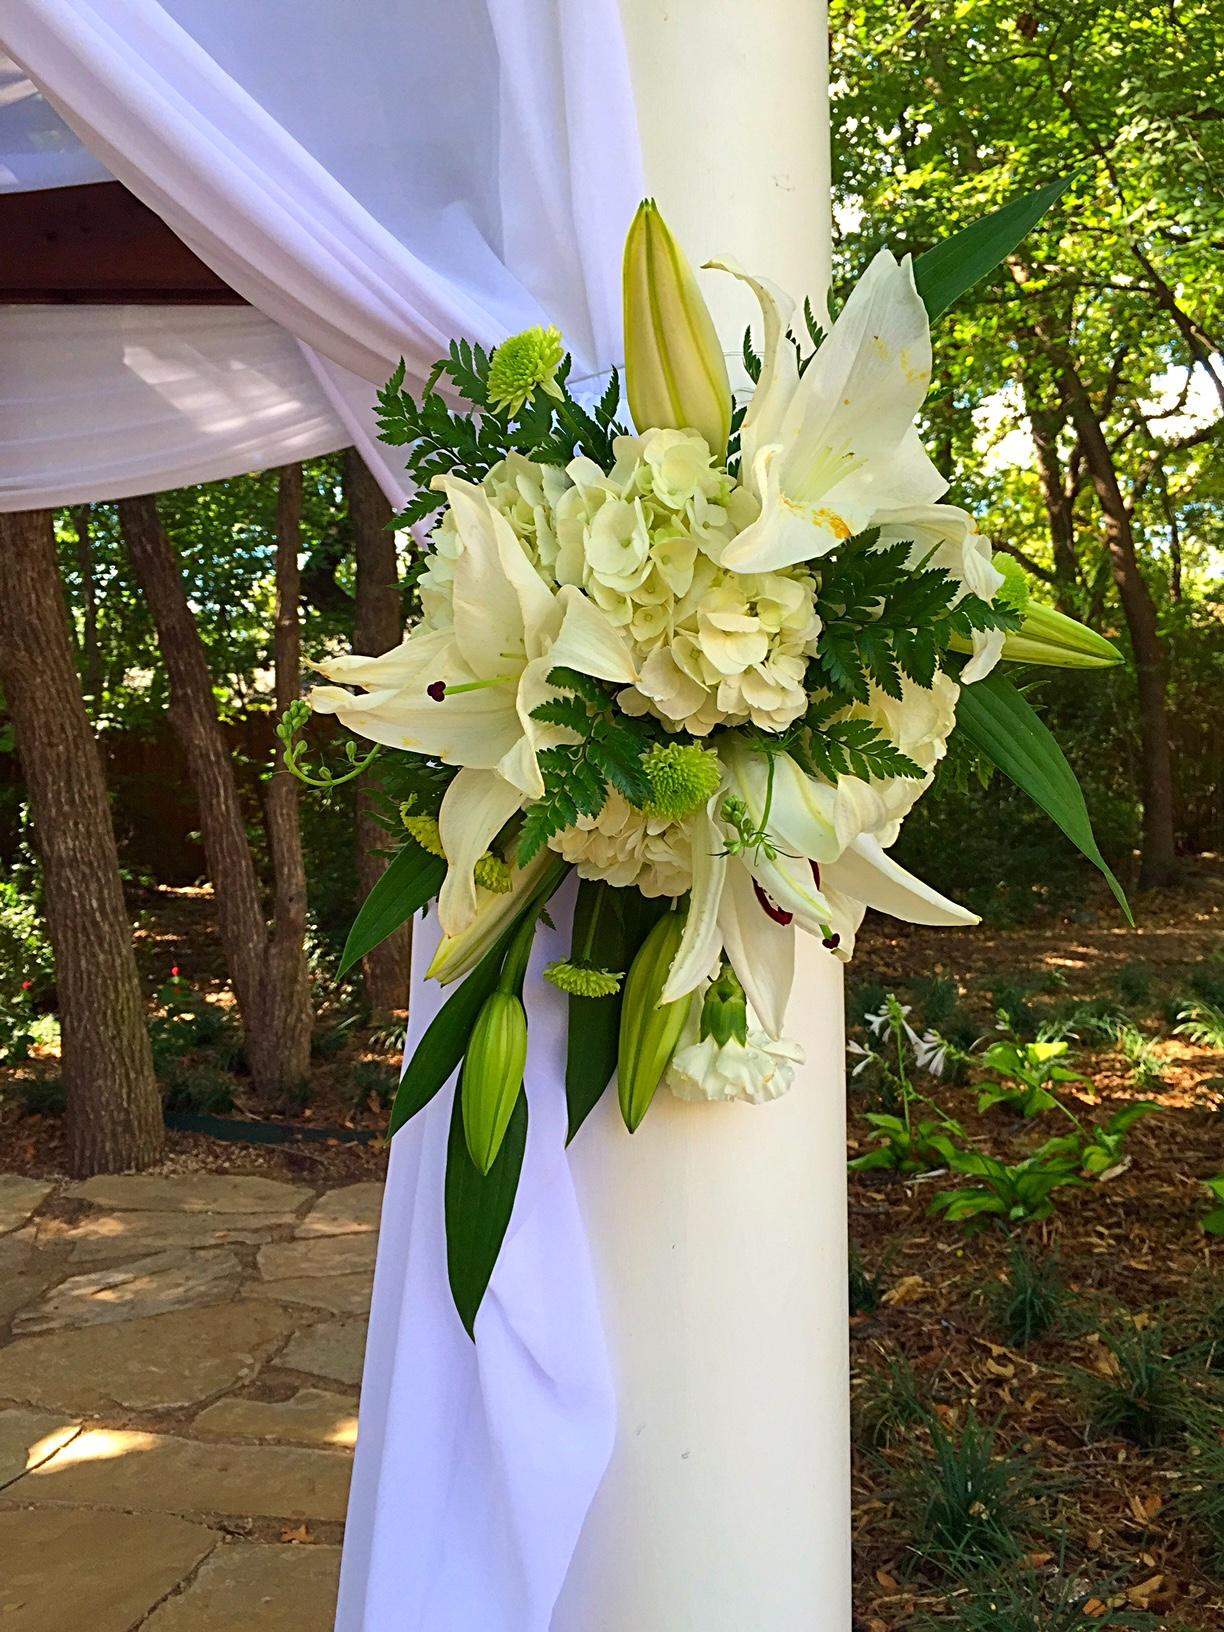 Dallas wedding florist and decorator dallas wedding event img2966 1 izmirmasajfo